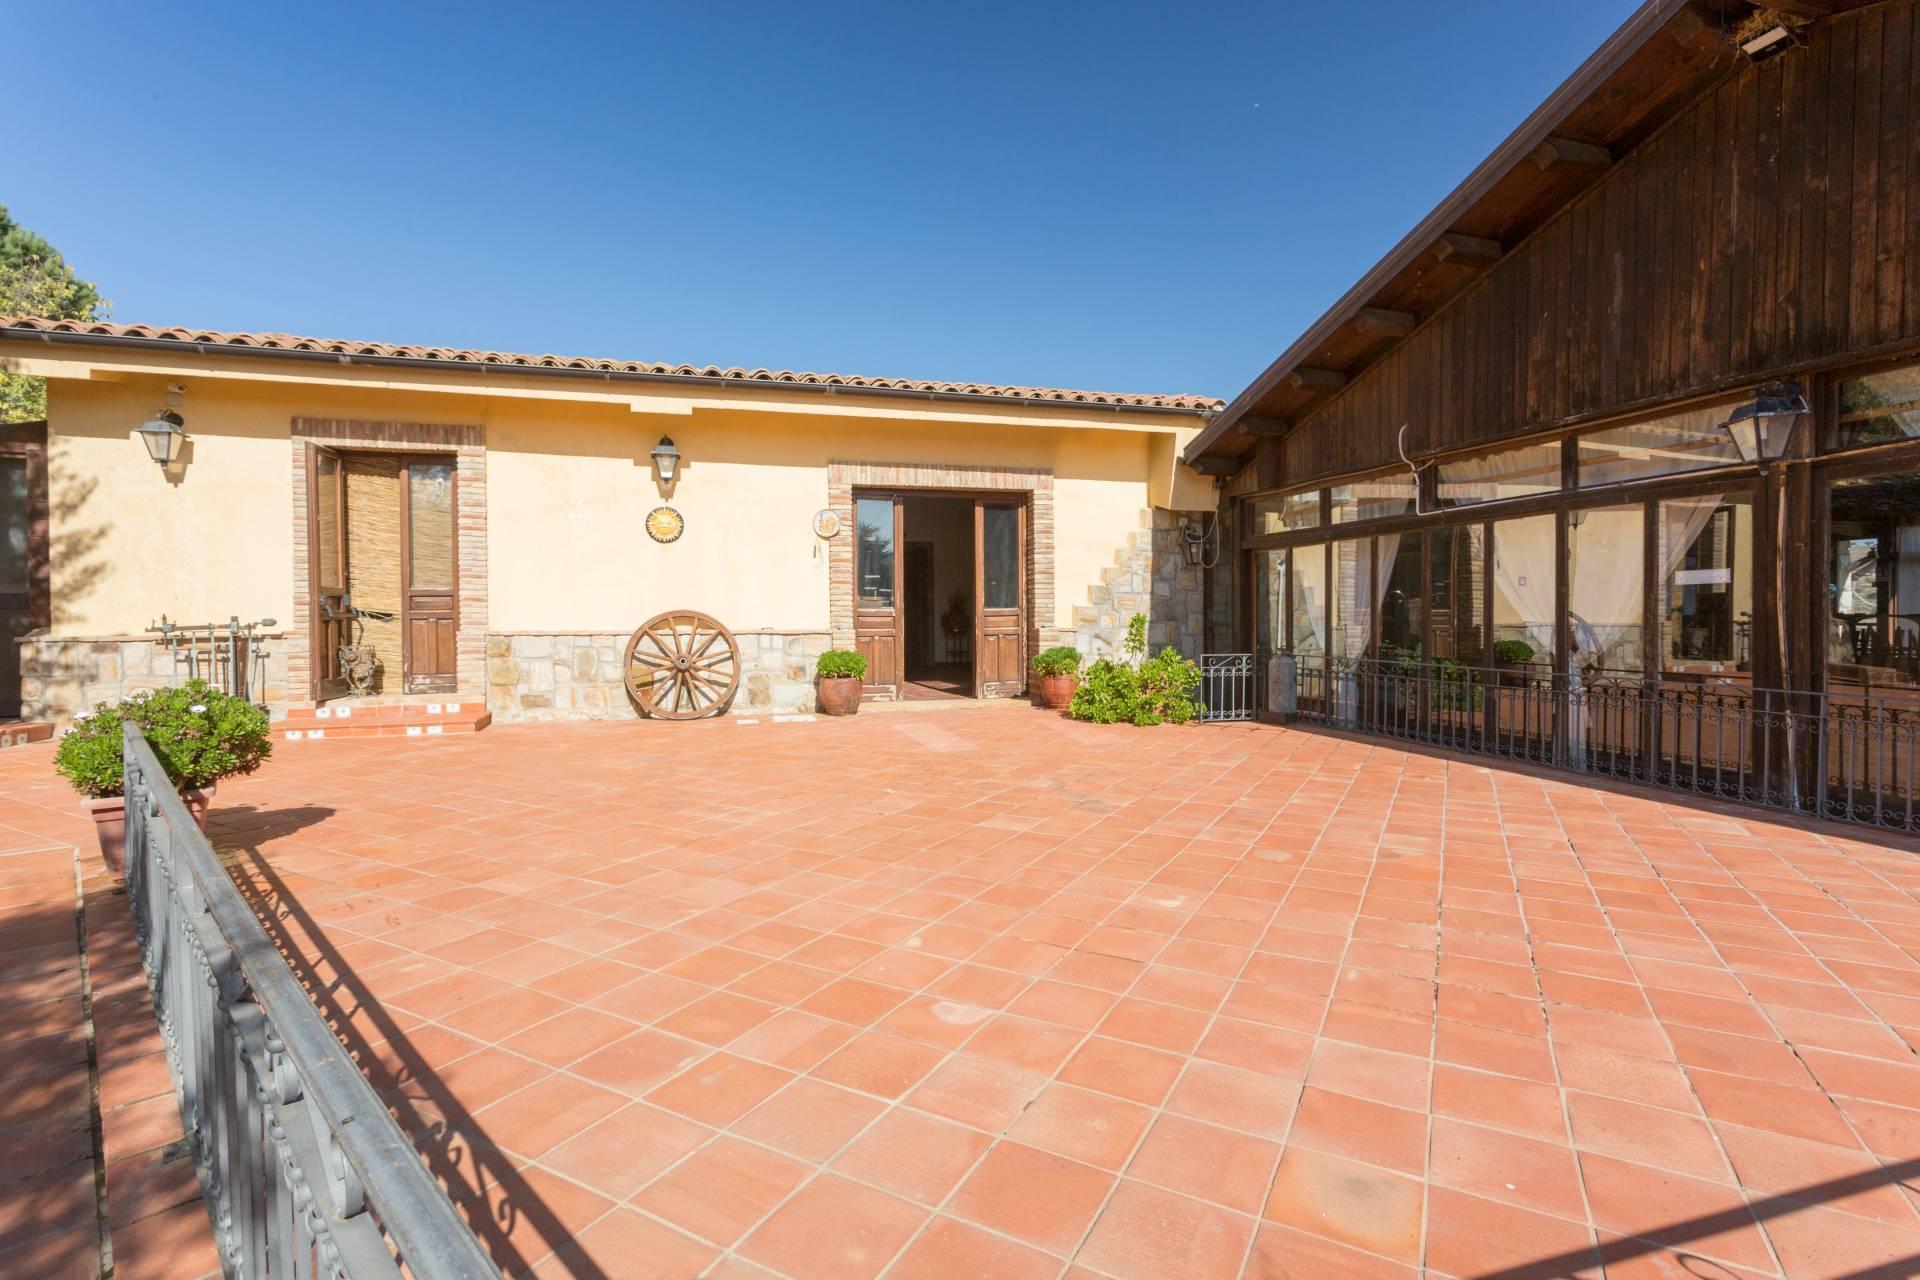 Farmhouse in the heart of Sicily - 20